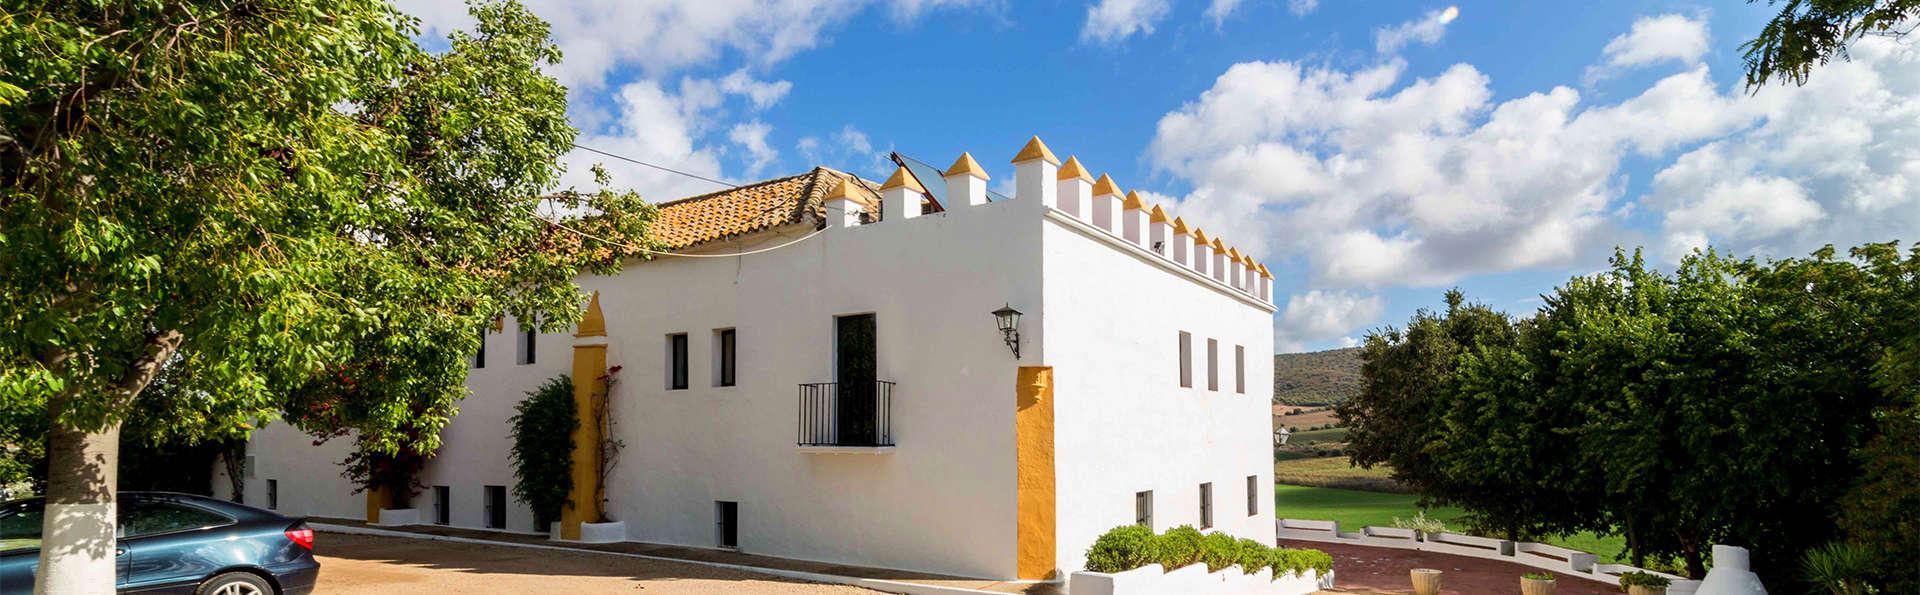 Hacienda El Santiscal - EDIT_Exterior2.jpg